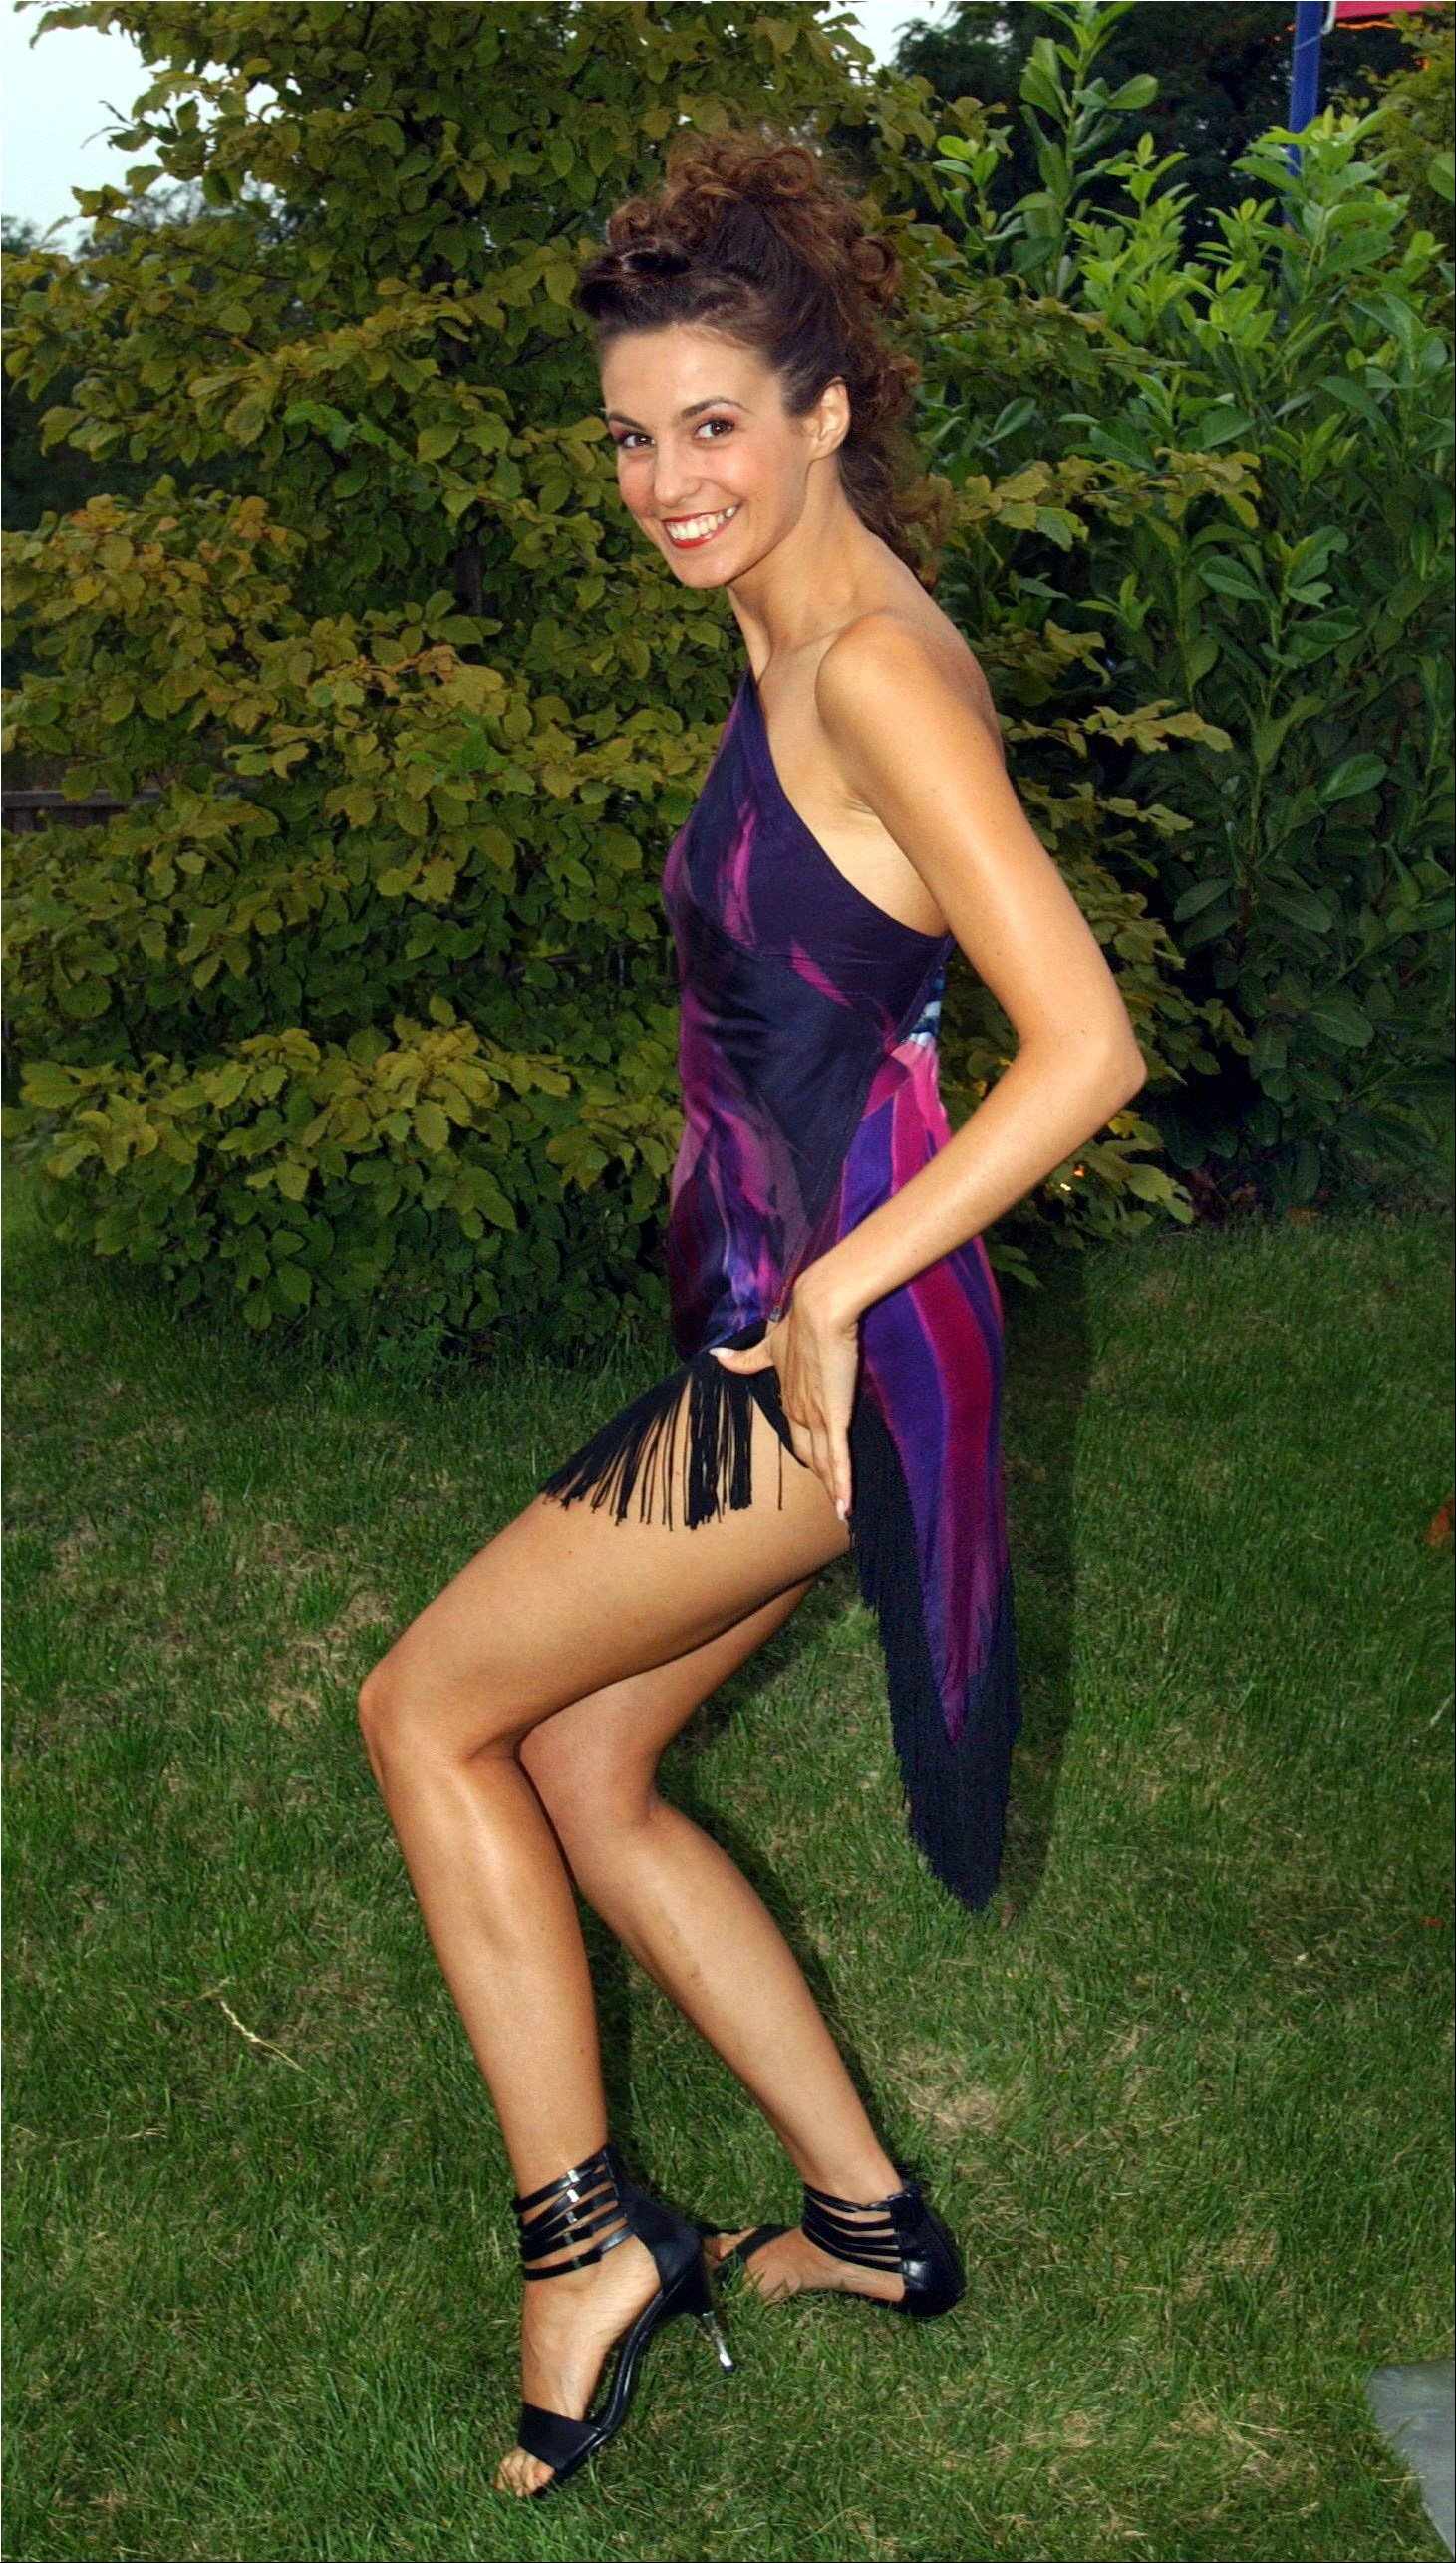 Katrin Wrobels Feet